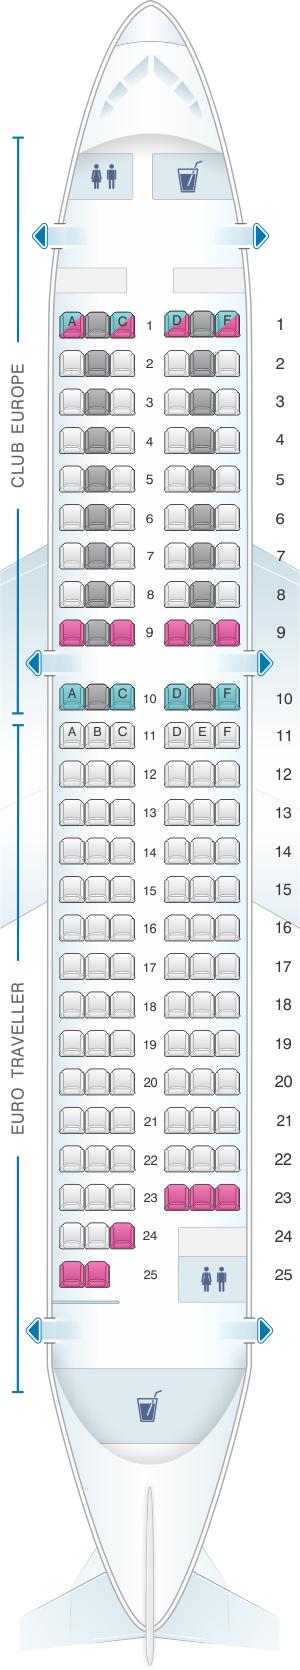 Seat map for British Airways Airbus A319 European Layout